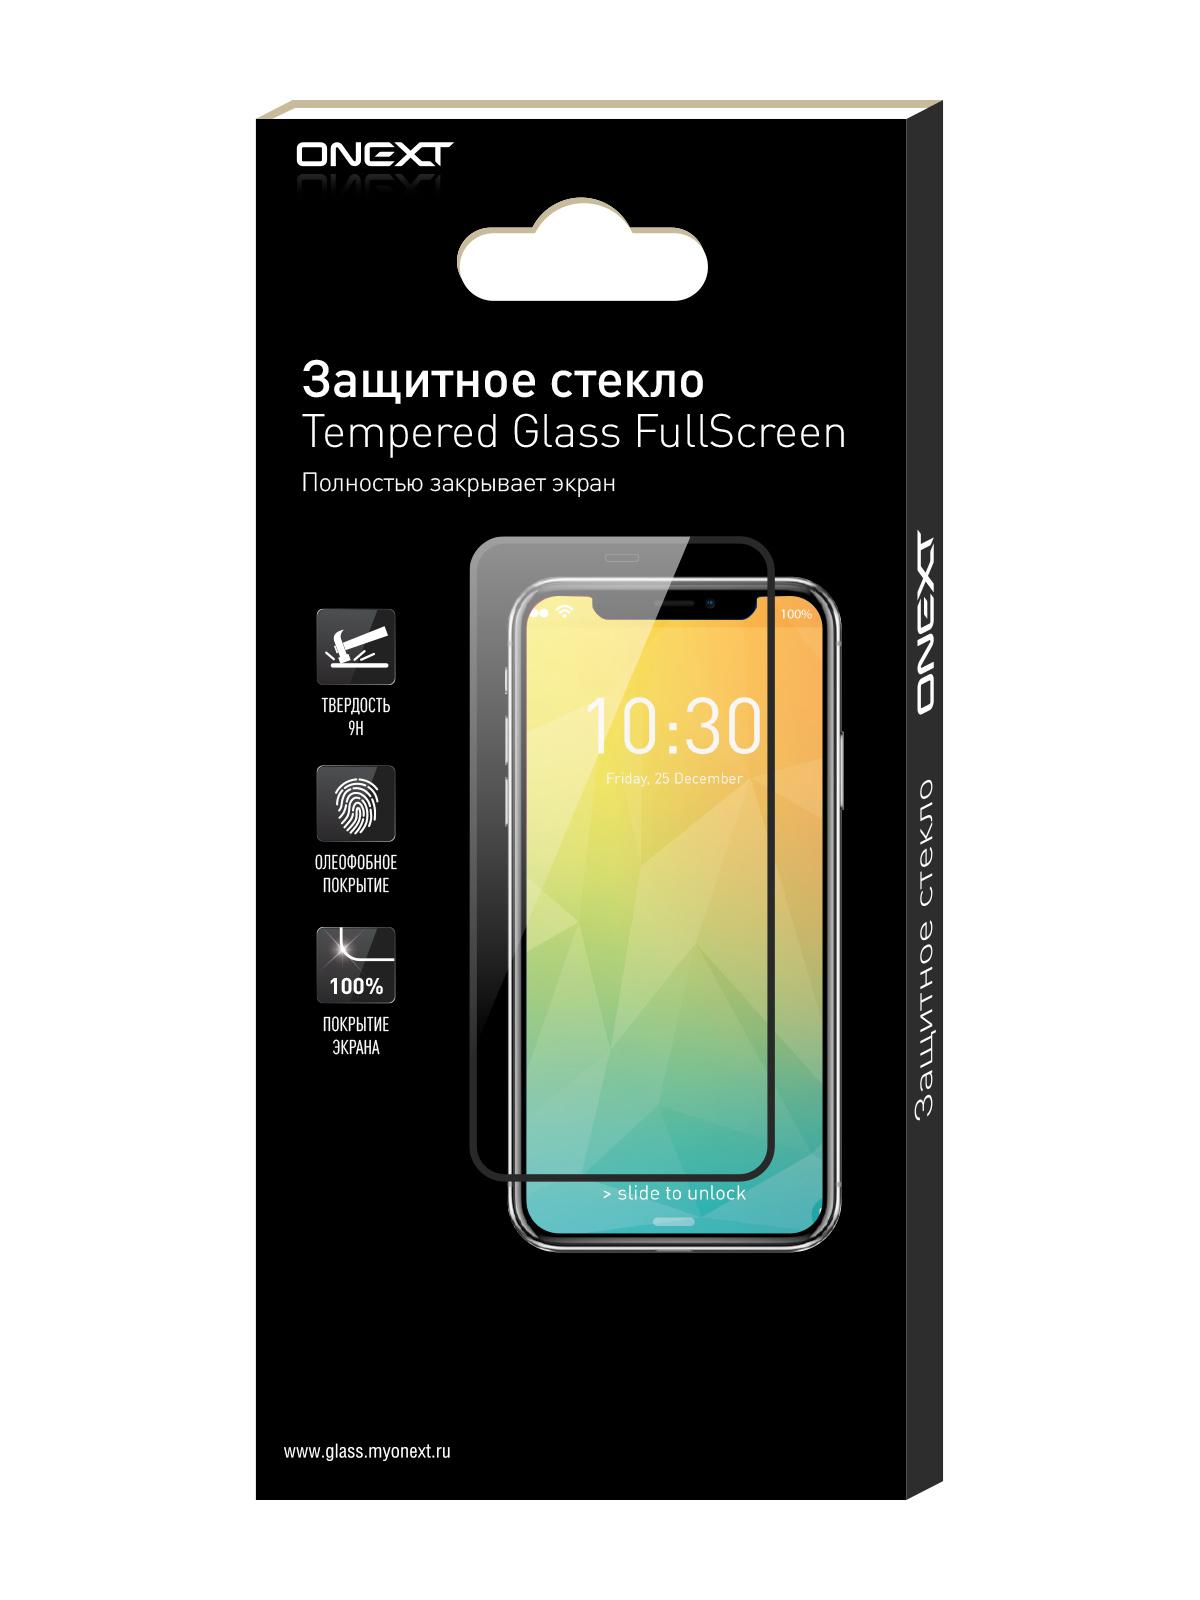 Защитное стекло ONEXT для Asus ZenFone 3 Max (ZC520TL) White